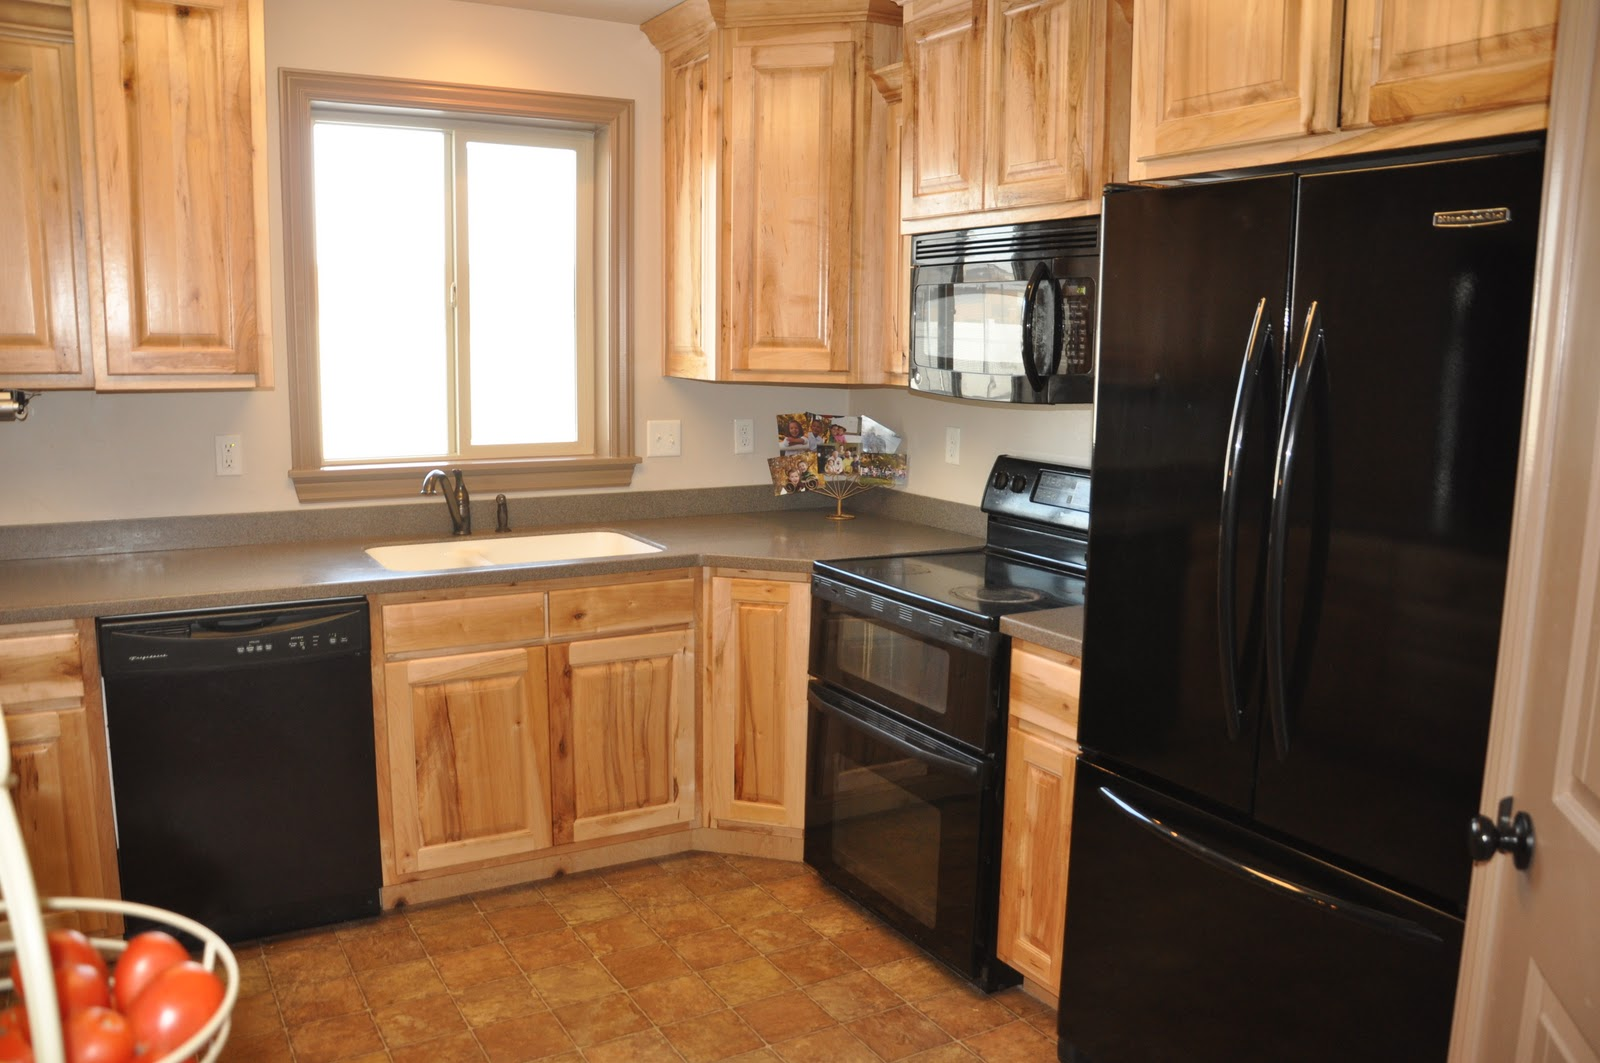 kitchen cabinet color ideas with black appliances photo - 10